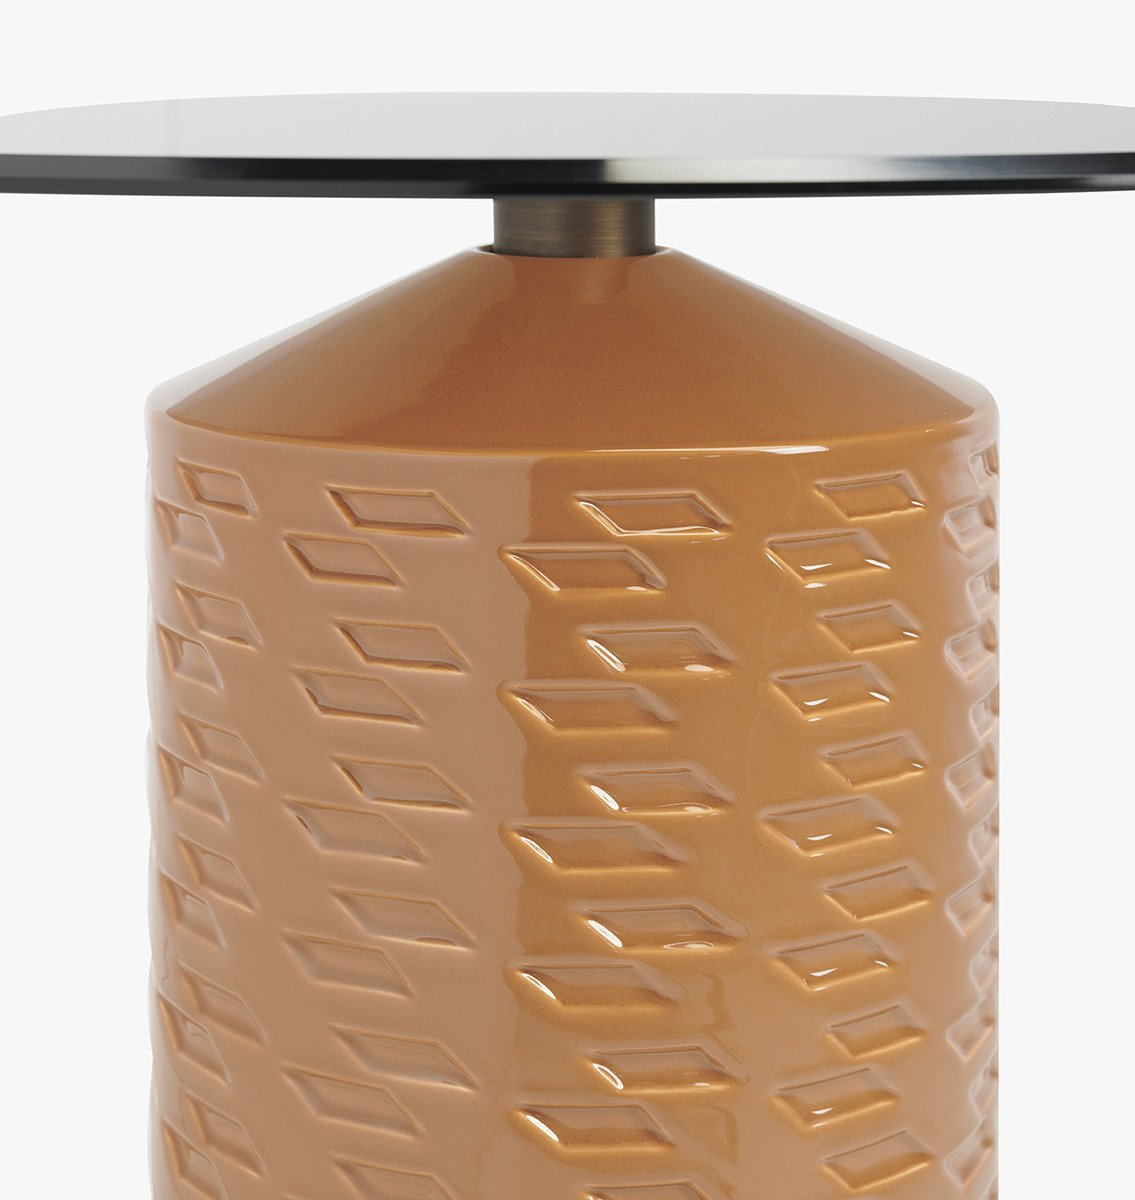 Hishi Coffee Table from Potocco, designed by Chiara Andreatti